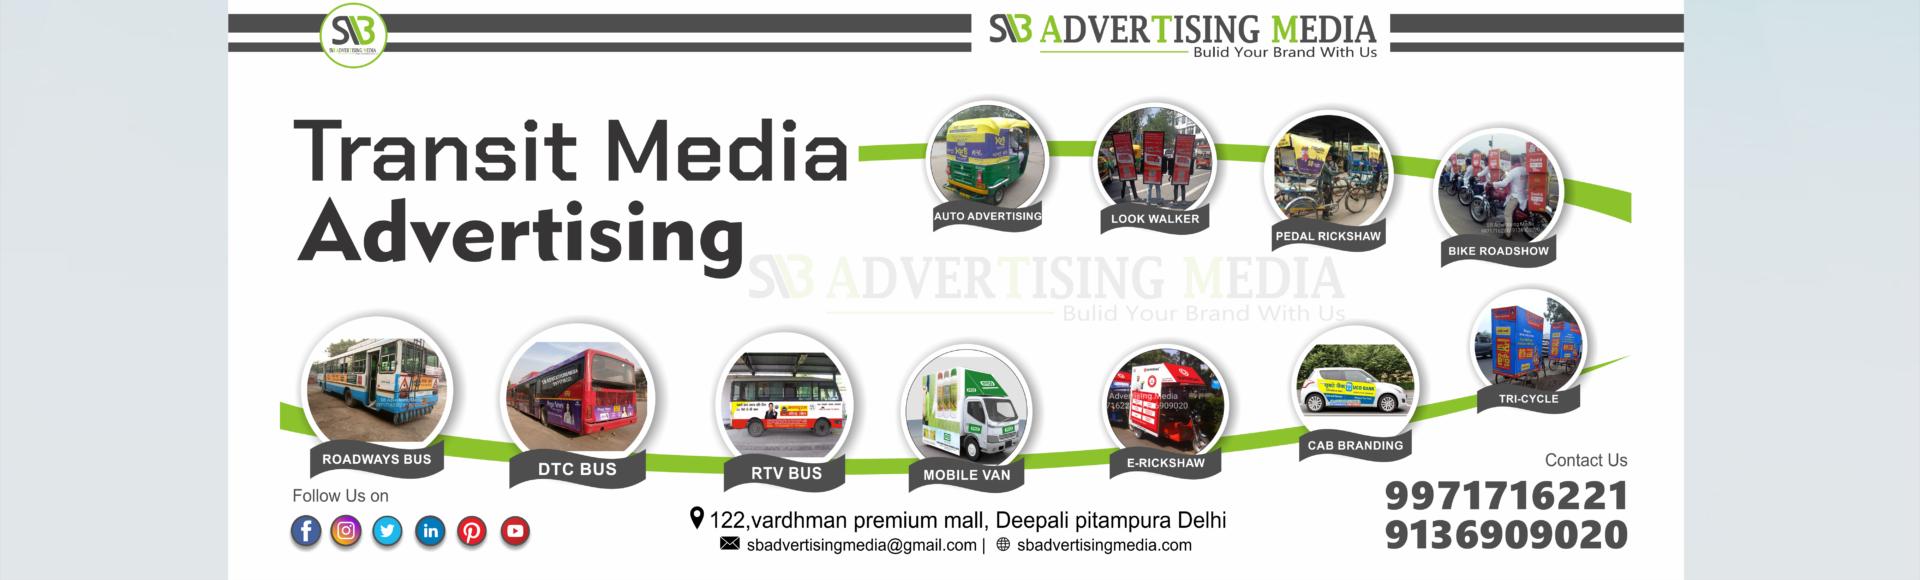 transit-media-advertising-banner.